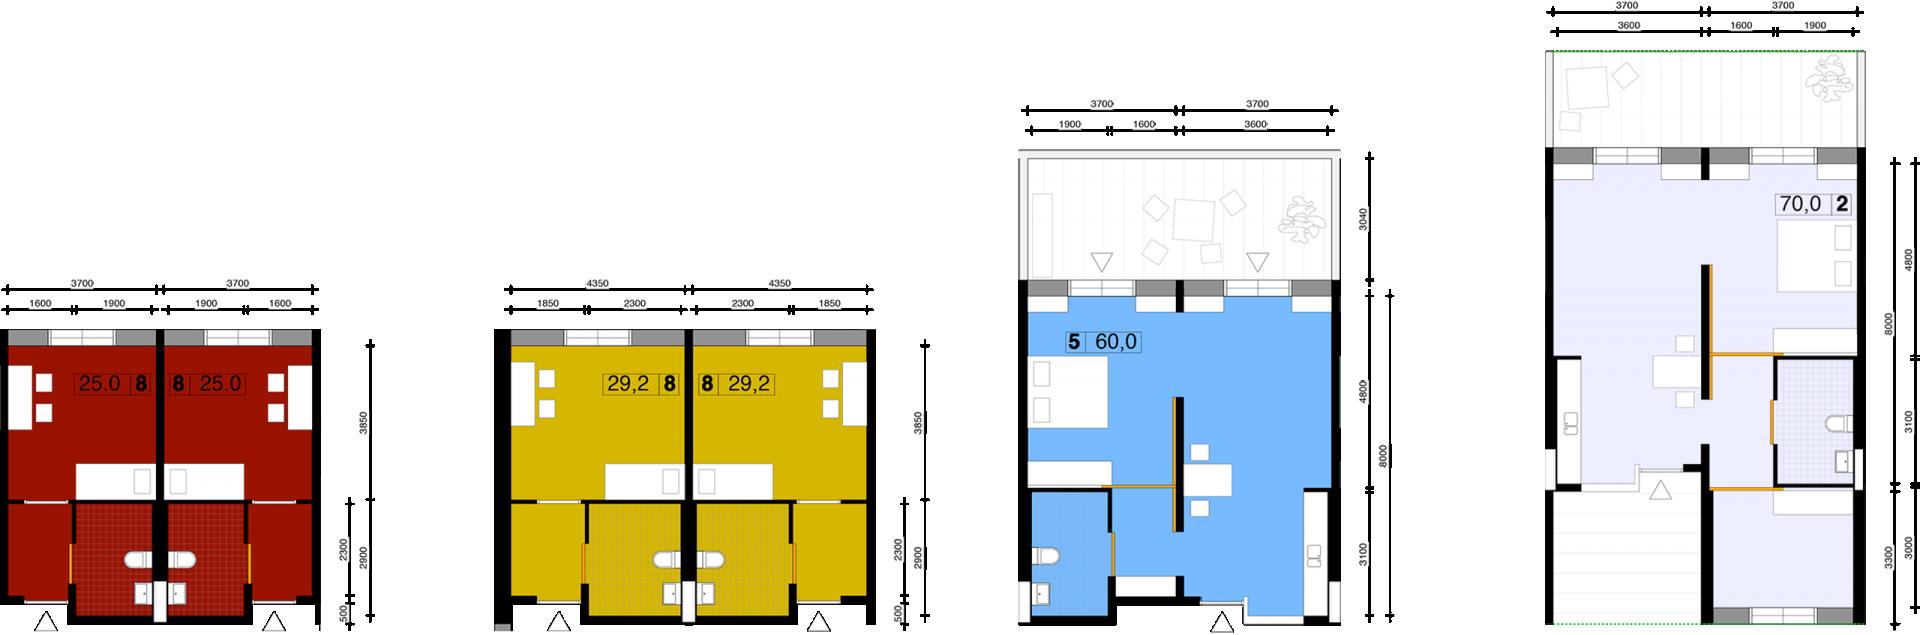 Kruishoutem Rooms